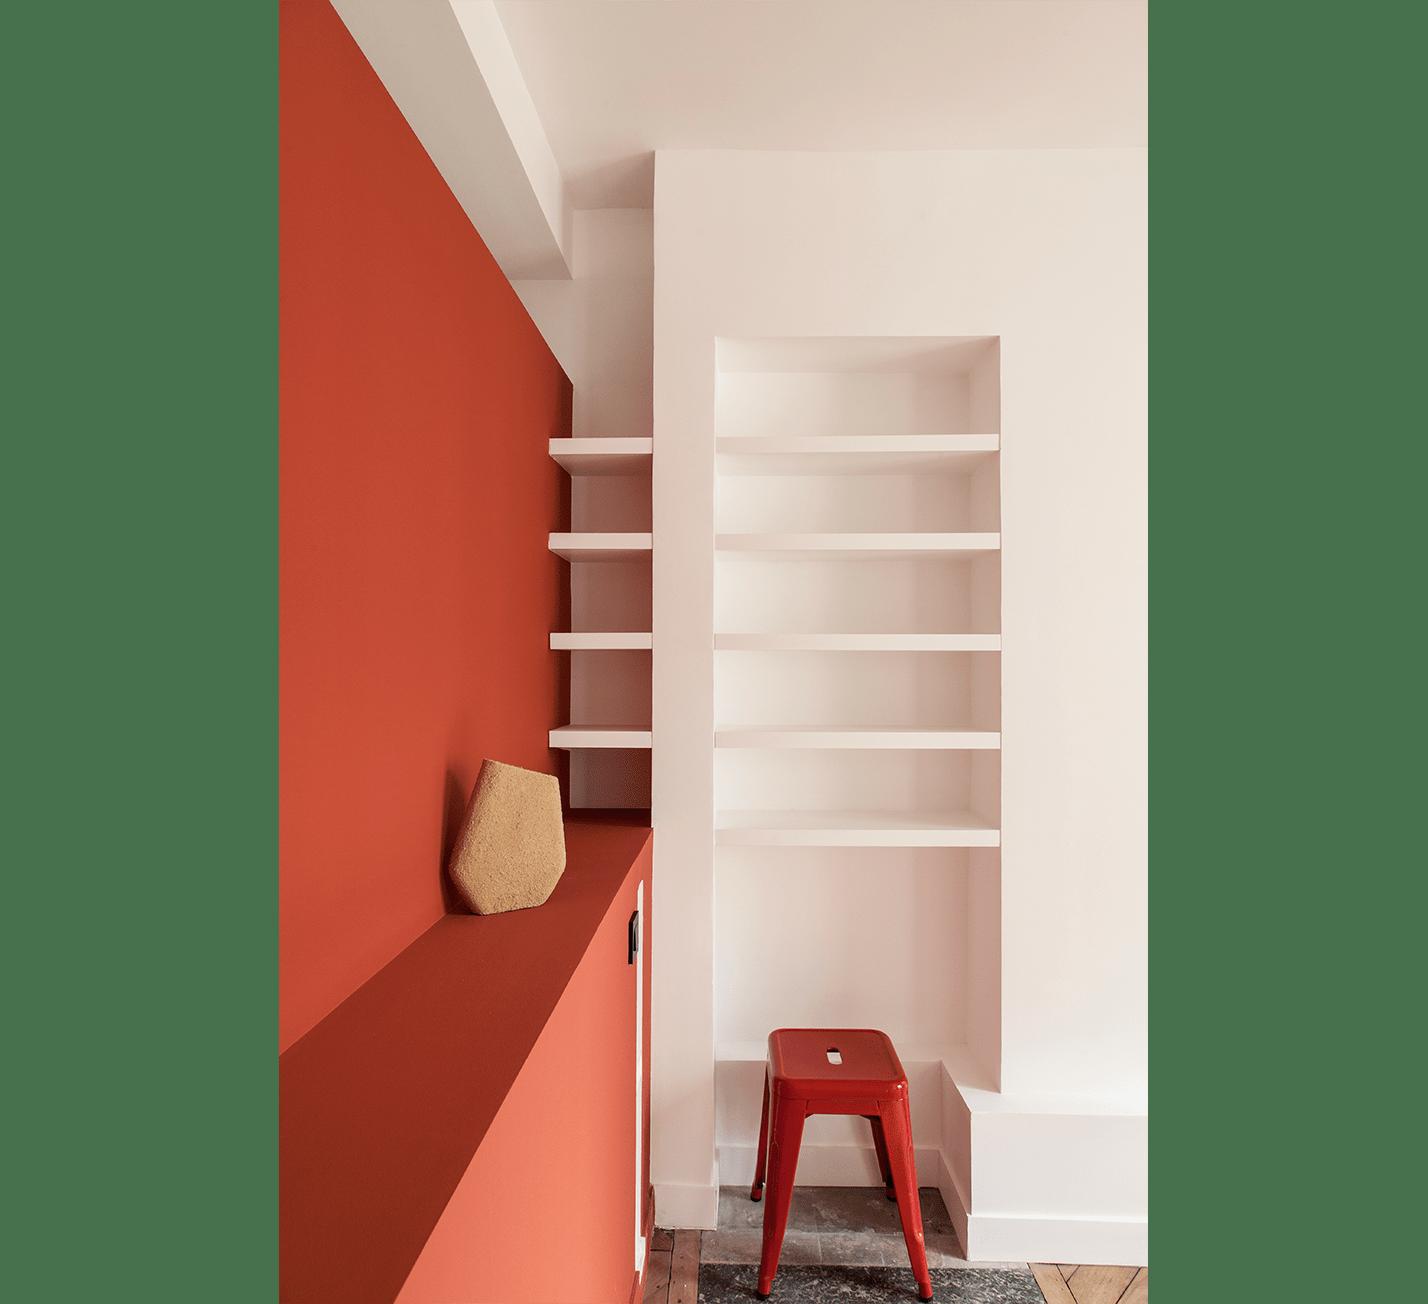 Projet-Jules-Cesar-Atelier-Steve-Pauline-Borgia-Architecte-interieur-11-min